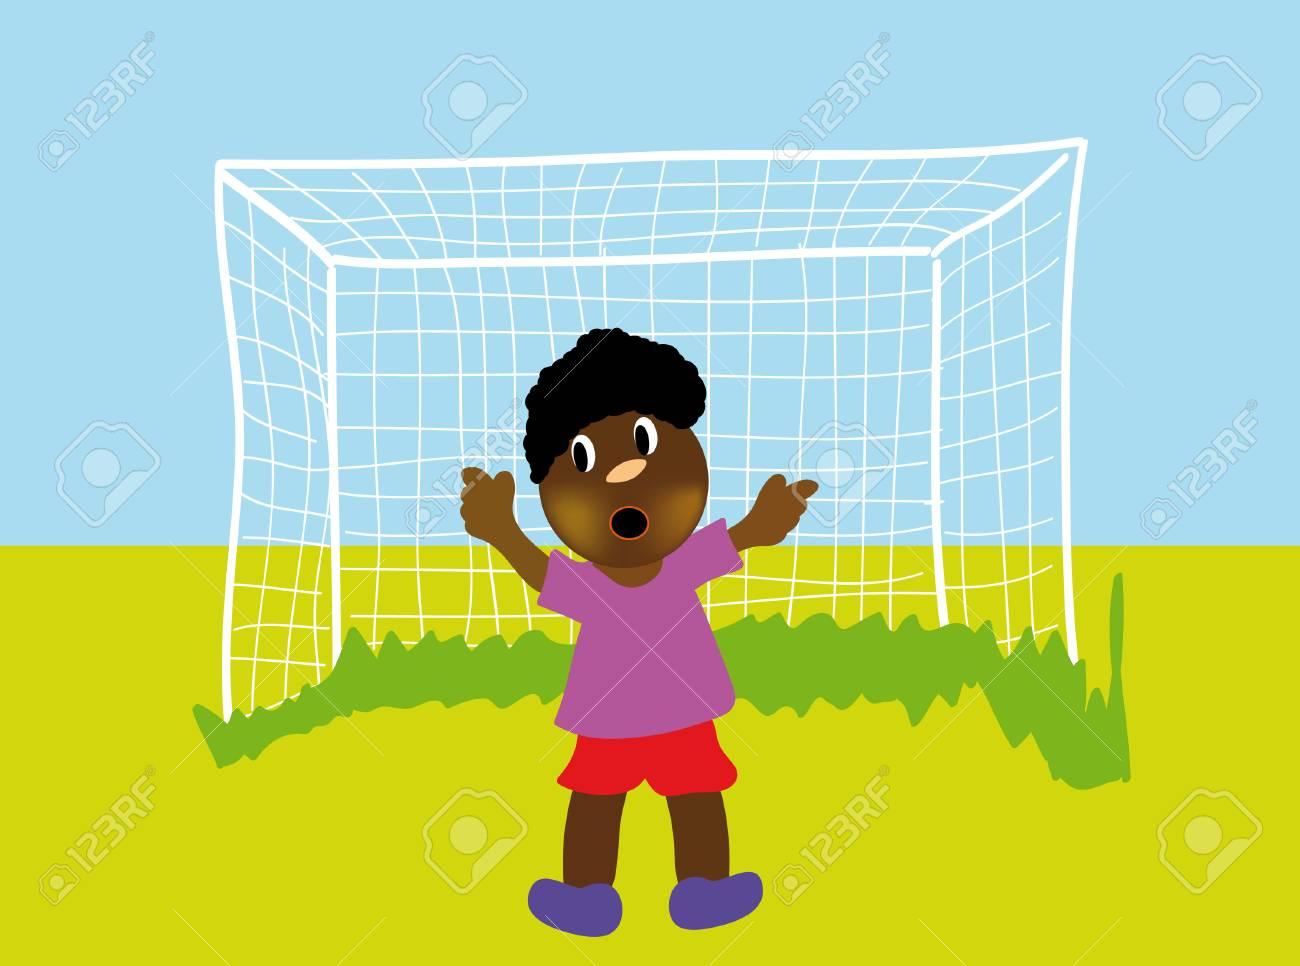 nice illustration of happy boy plaing football isolated on white background Stock Vector - 5941224